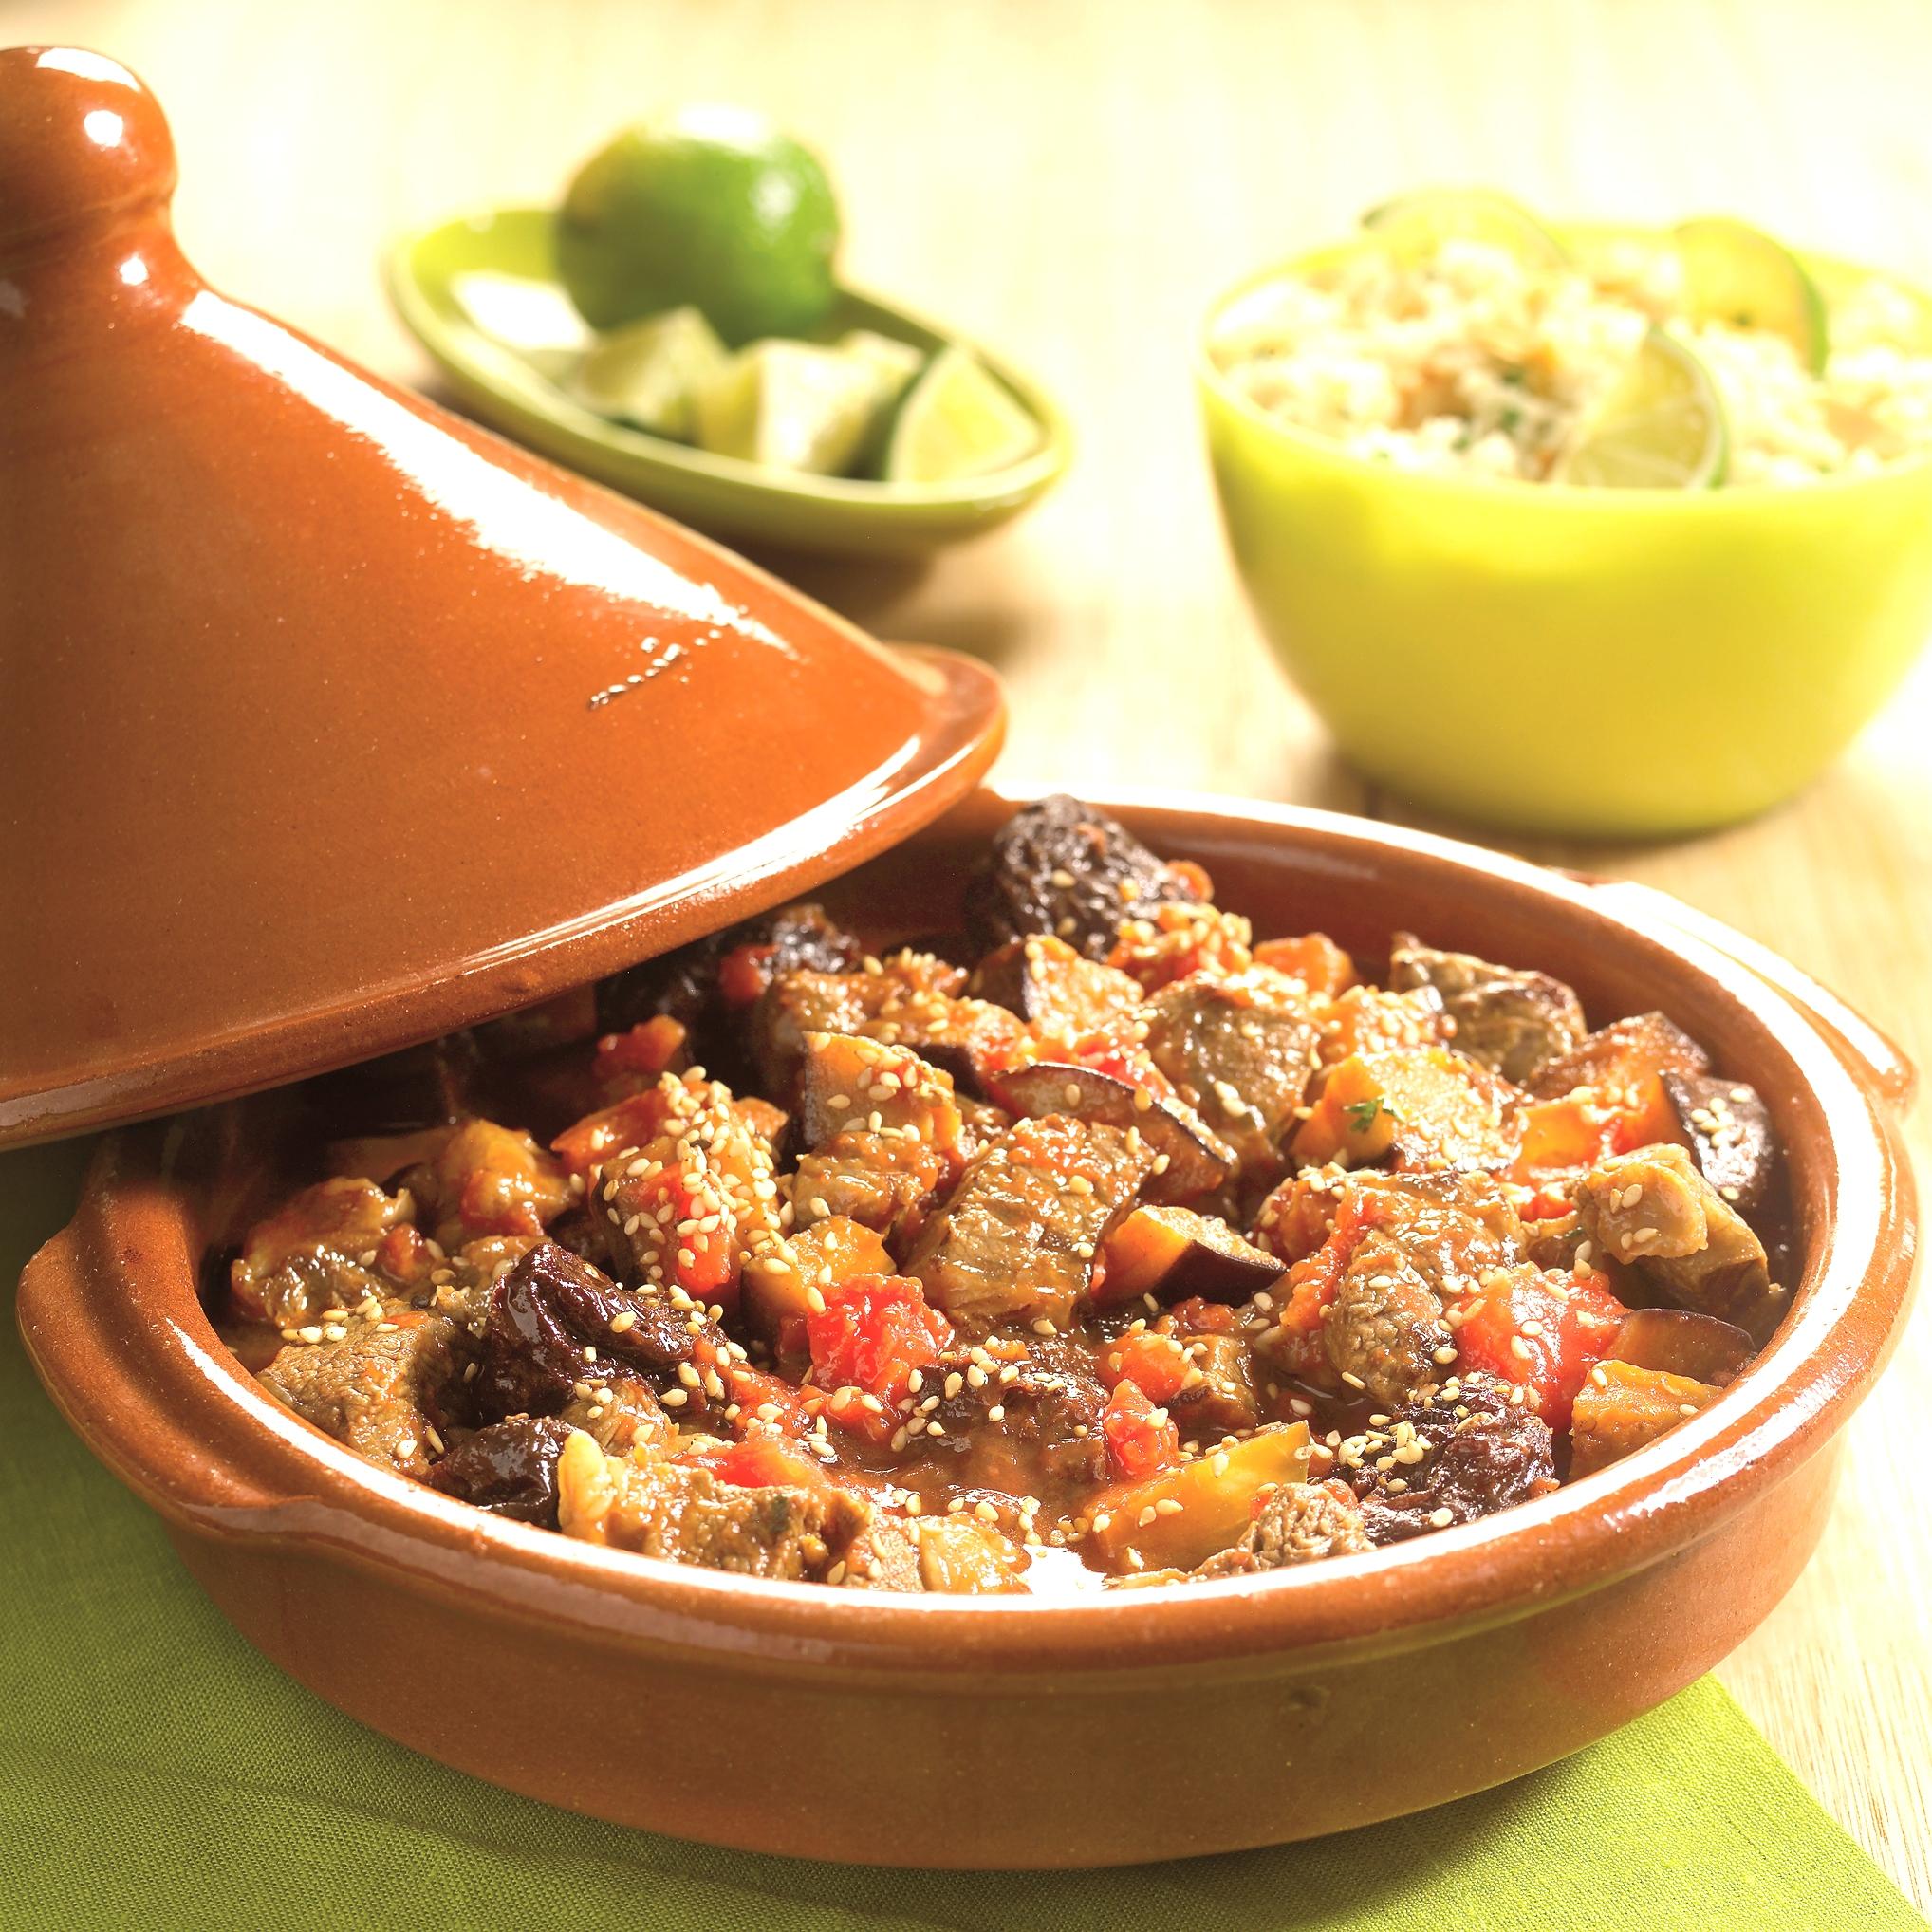 tajine Morocco cooking